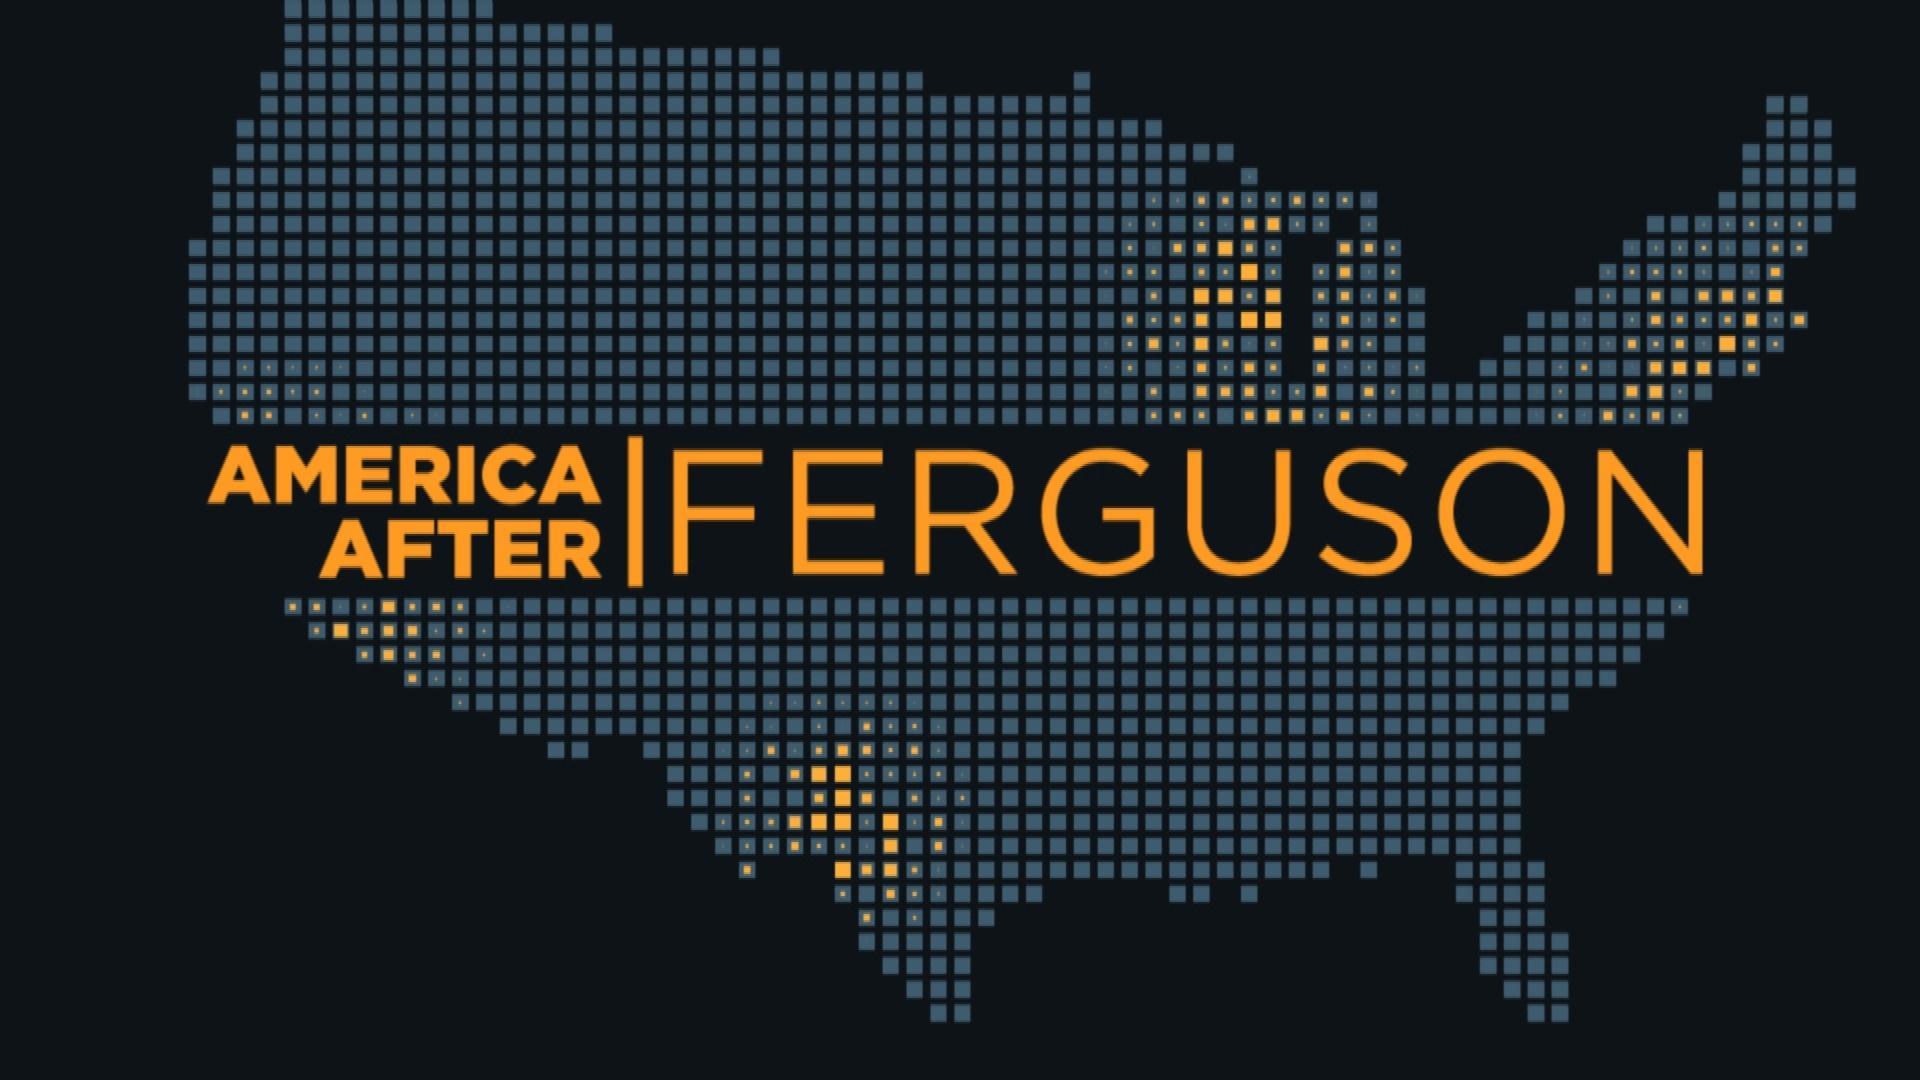 America After Ferguson graphic